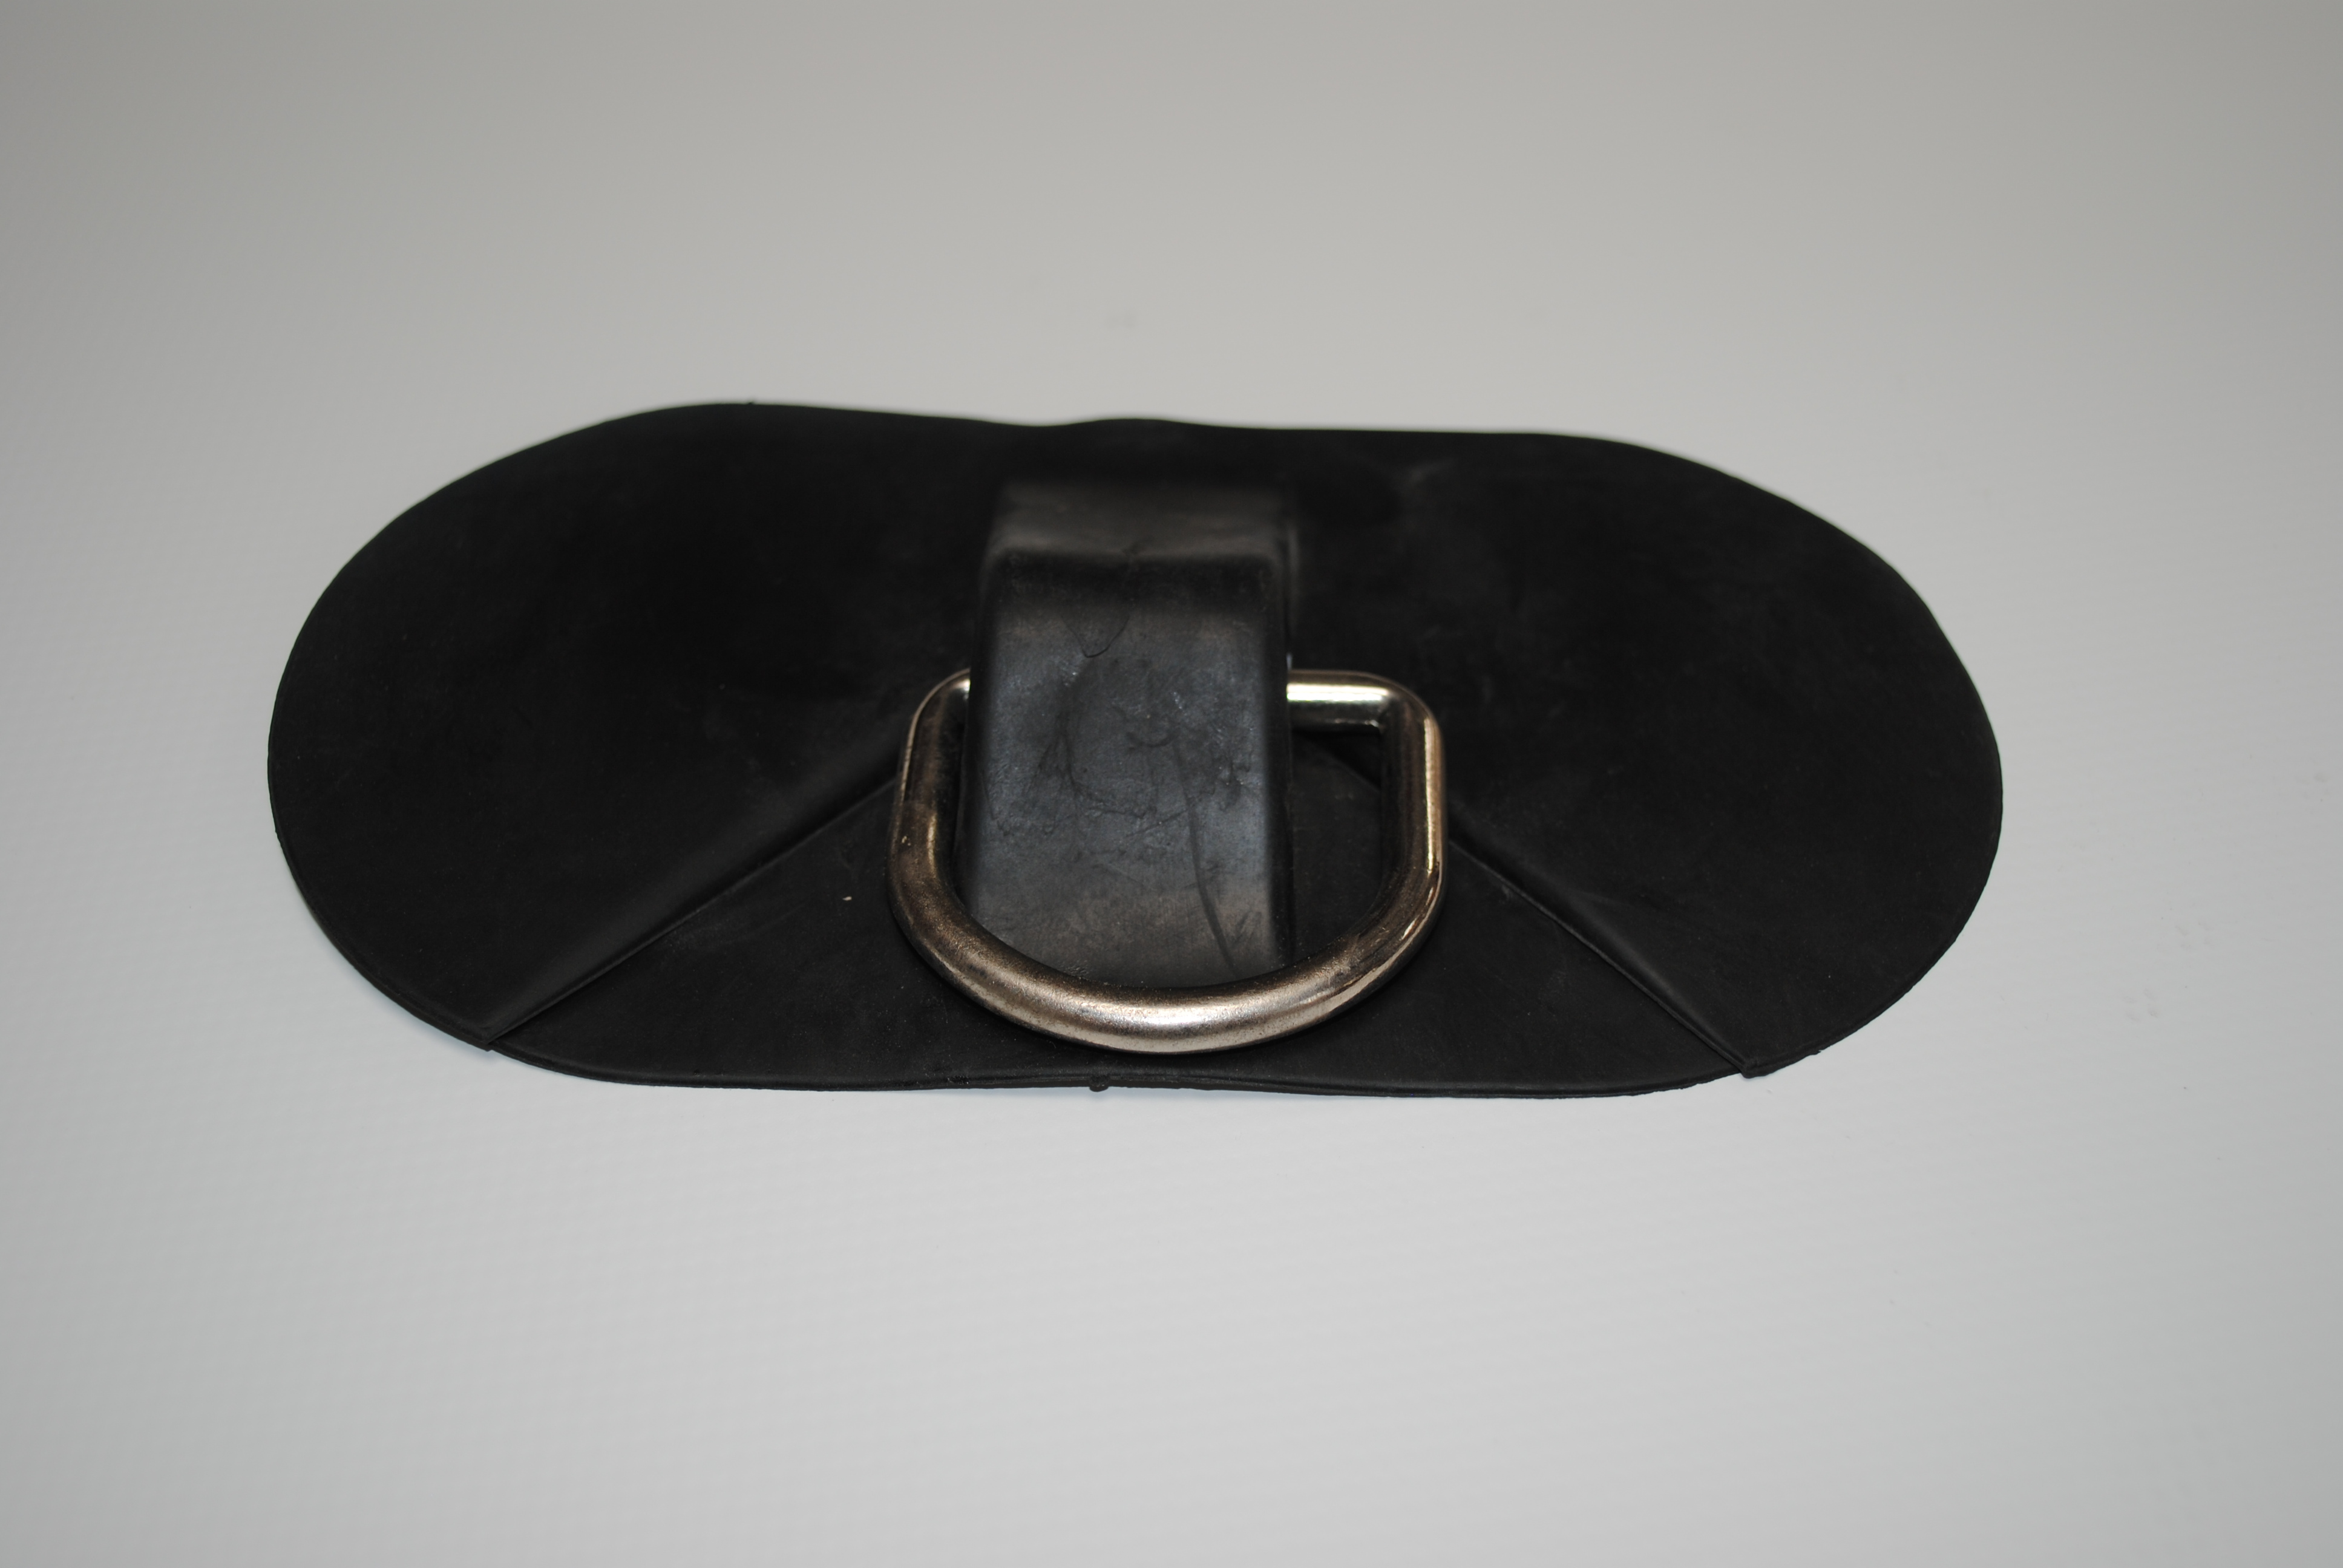 PVC Bow Black Oblong Base inc D Ring 175mm x 93mm